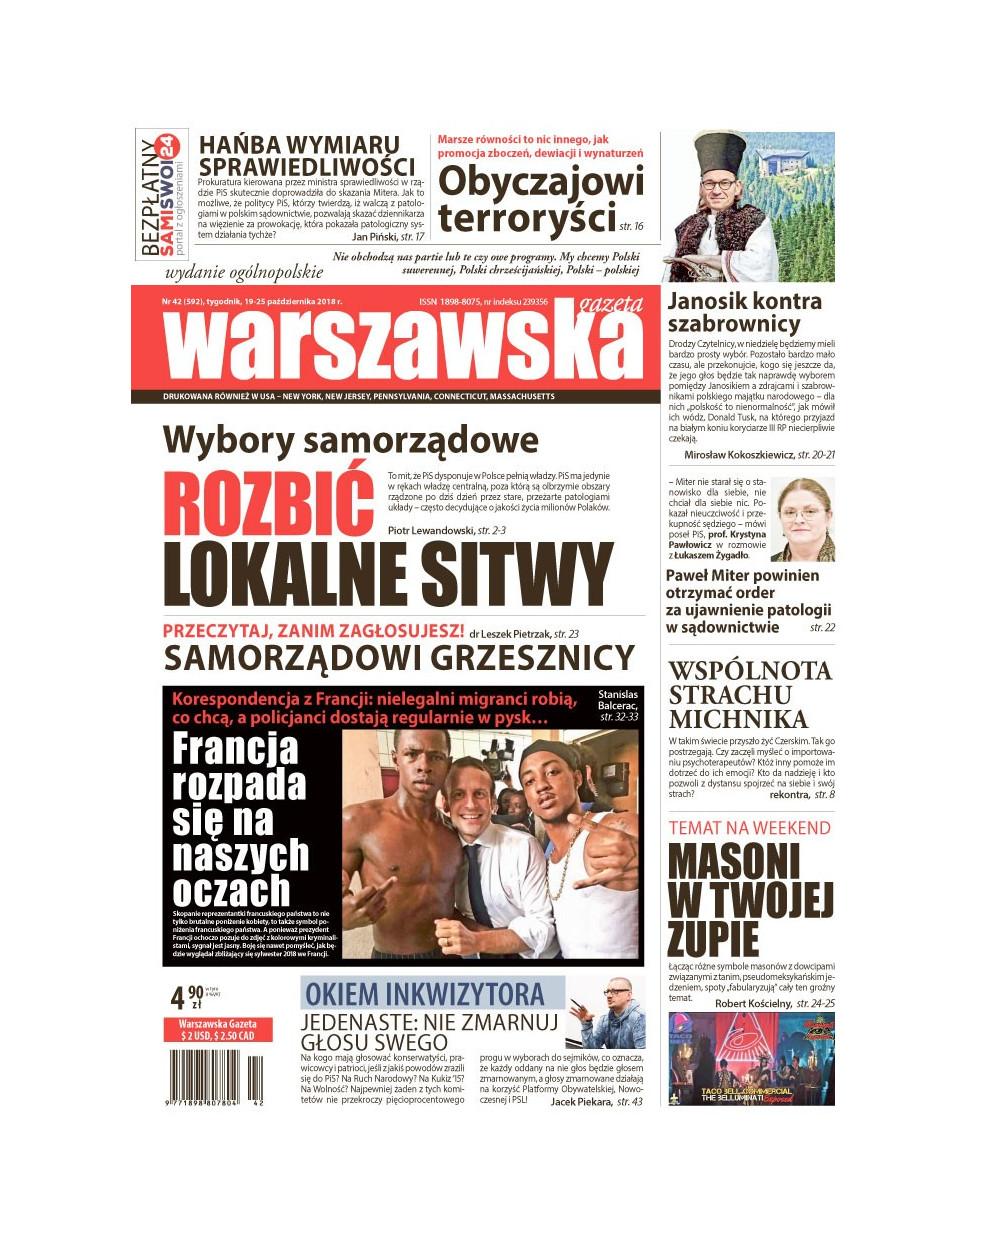 Warszawska Gazeta 42/2018